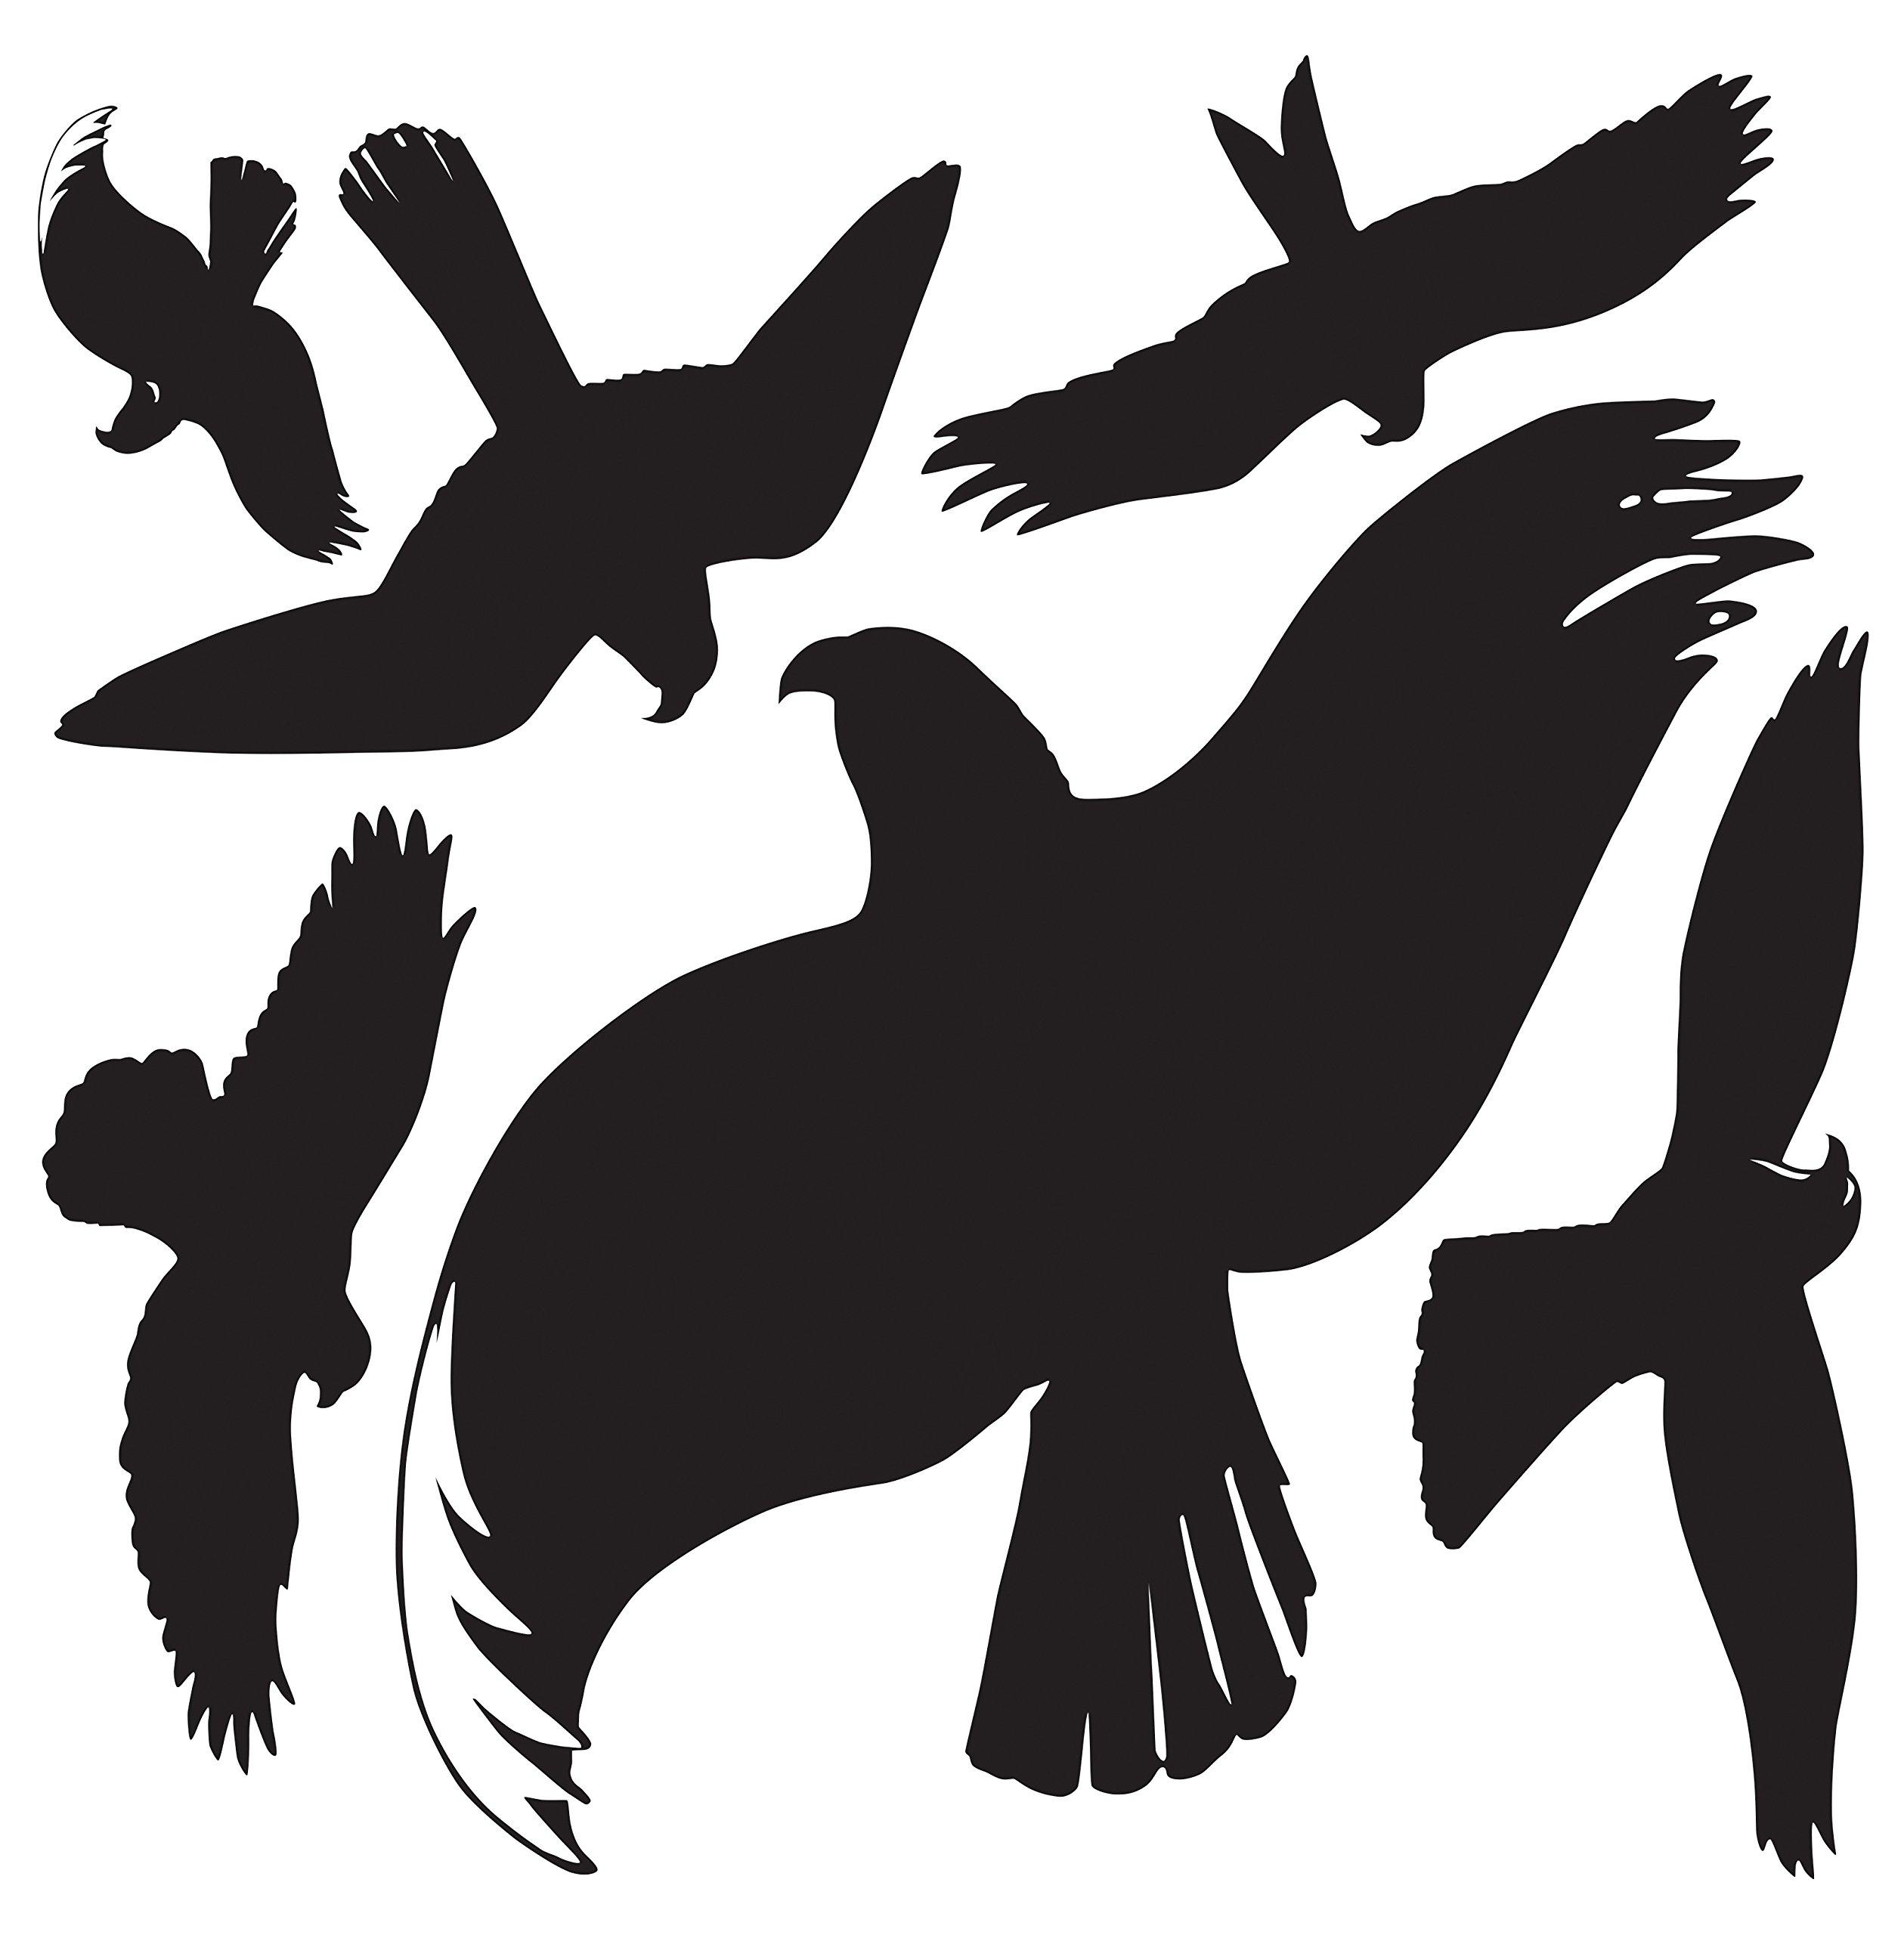 Avery Zweckform 4485Warning Birds Black (Foil) 6Stickers Black by Avery Dennison (Image #2)